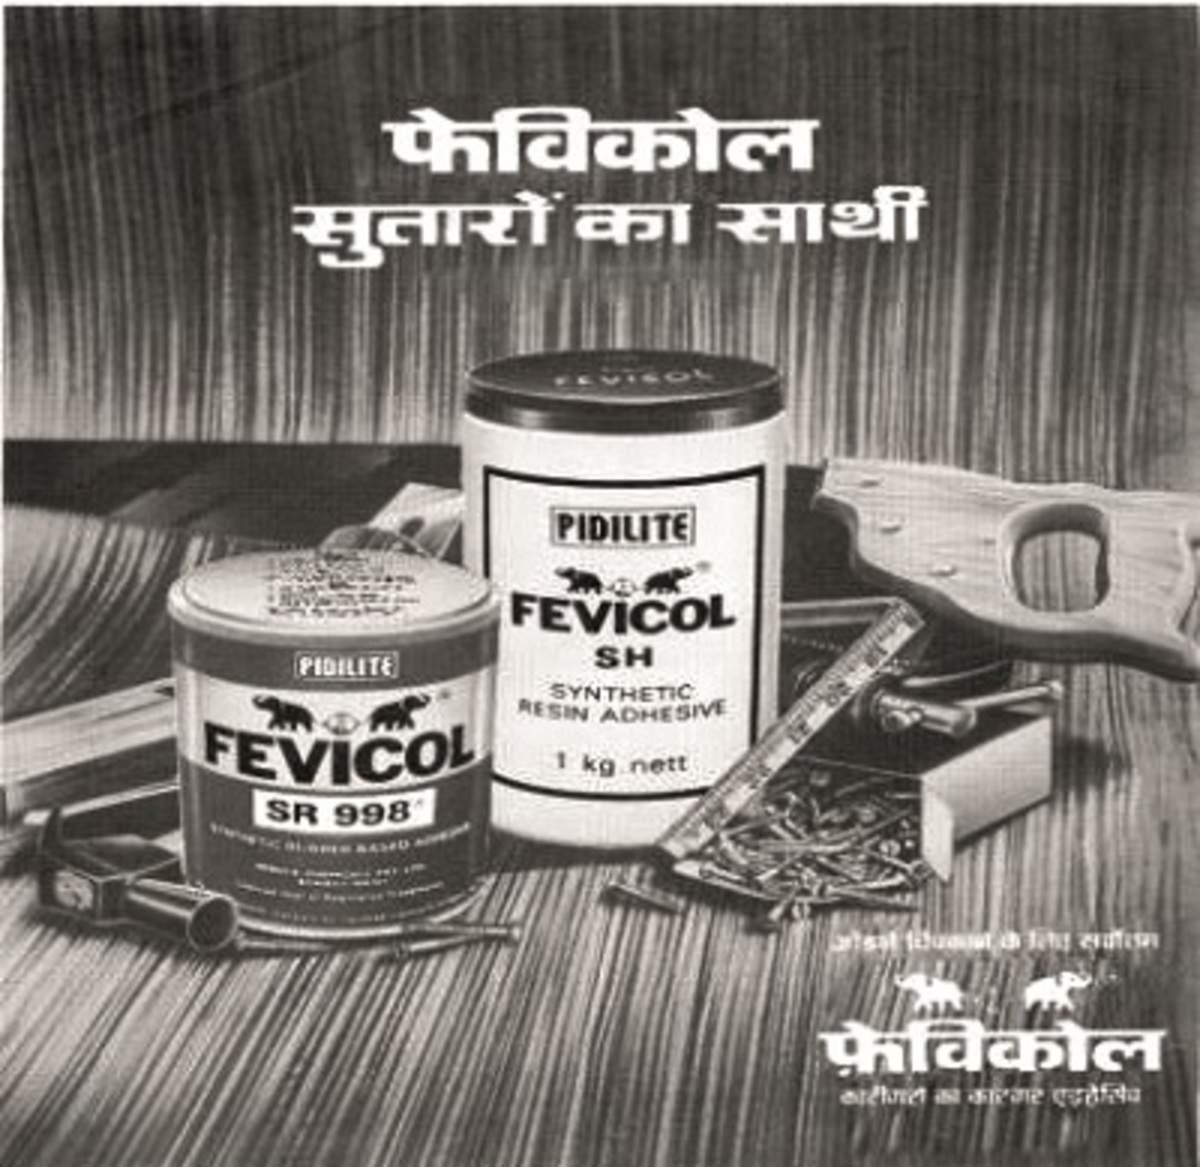 Fevicol The Gluing Journey Marketing Advertising News Et Brandequity